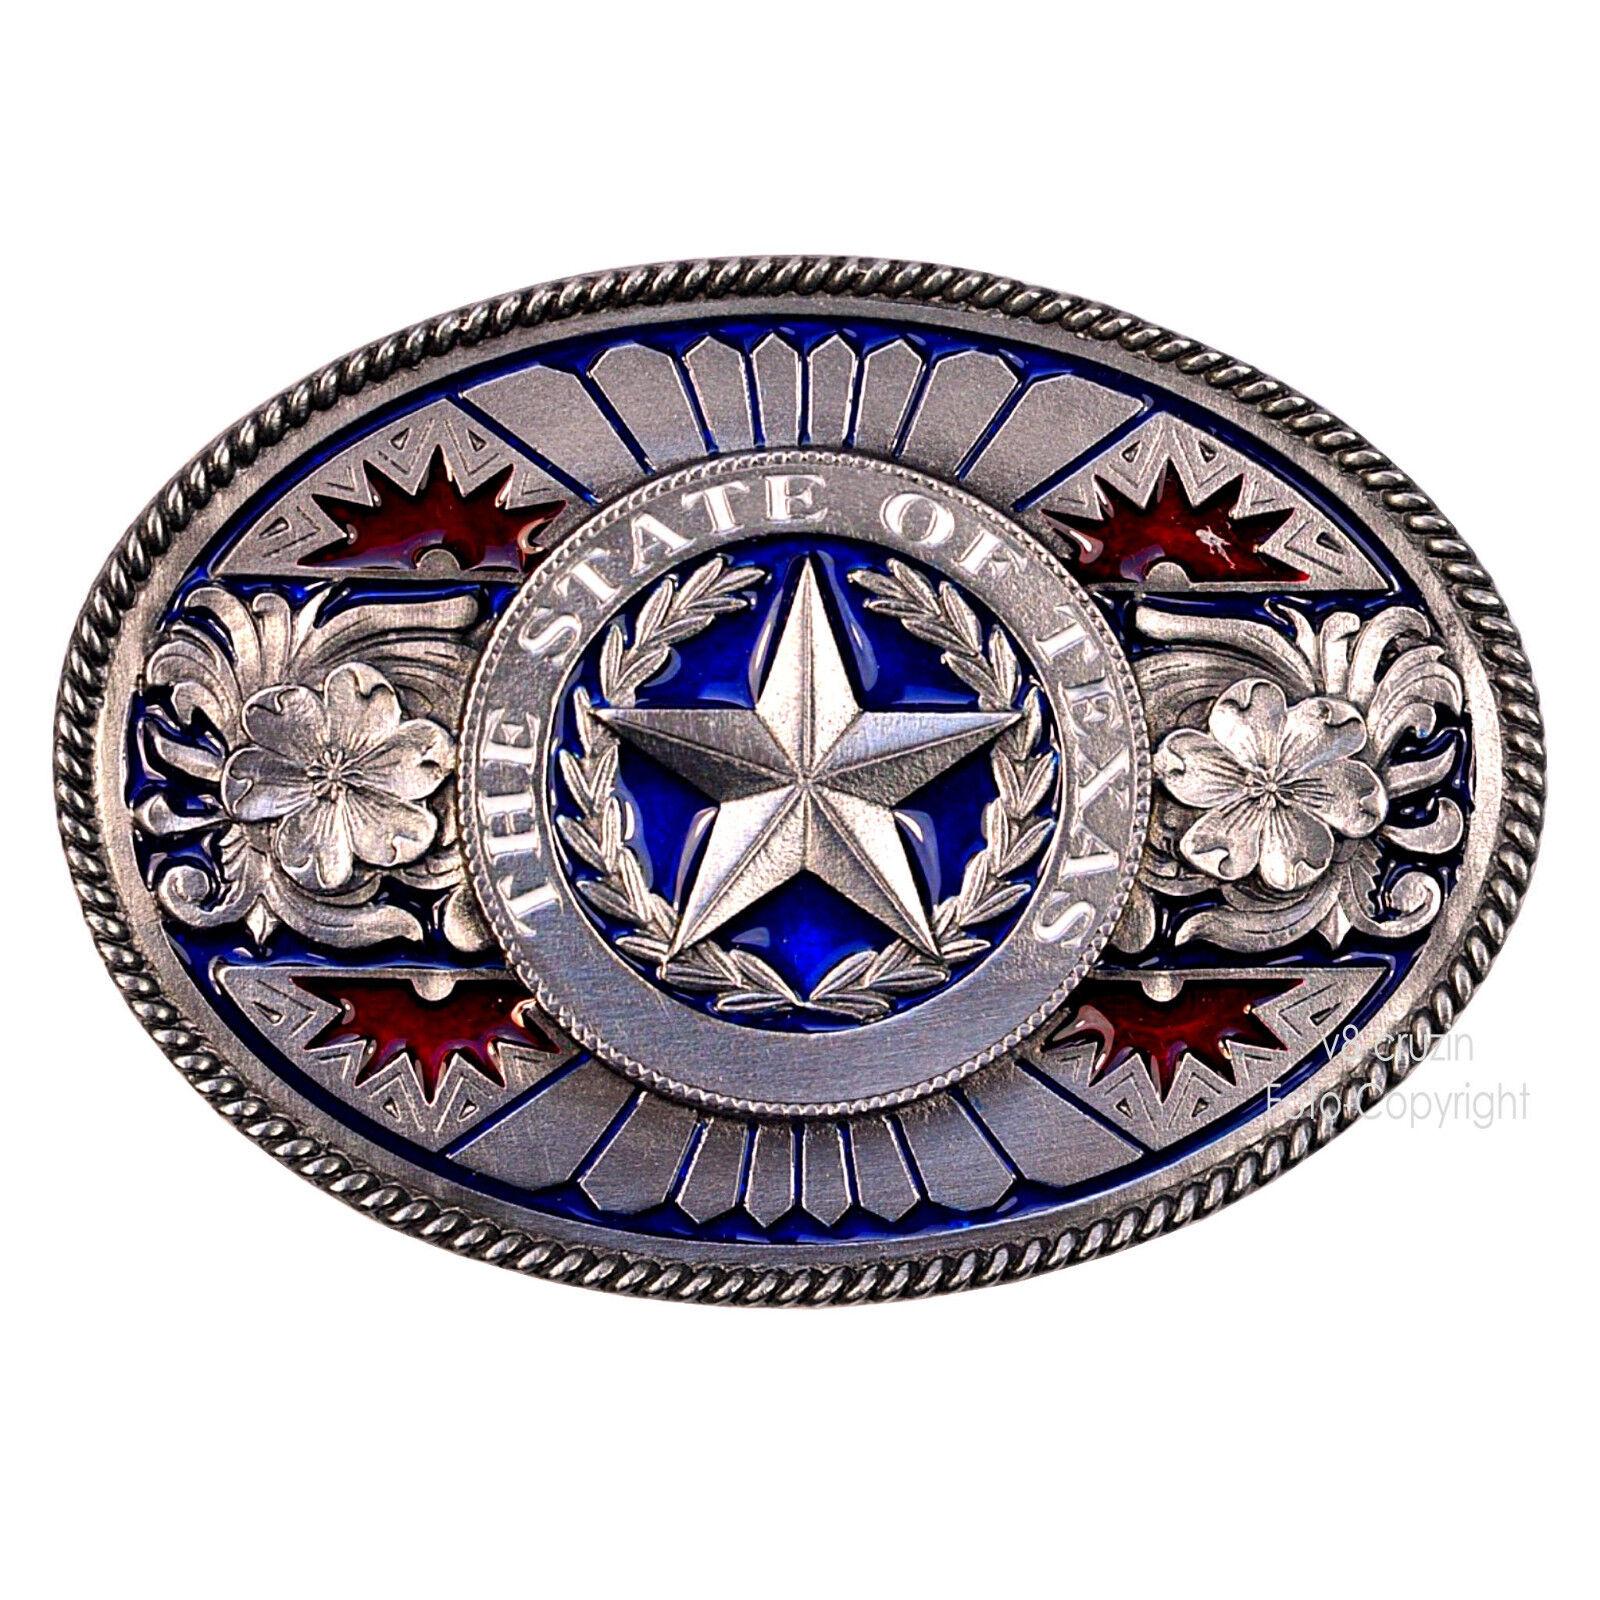 US Texas State Gürtelschnalle Star Belt Cowboy Western Country Buckle *467